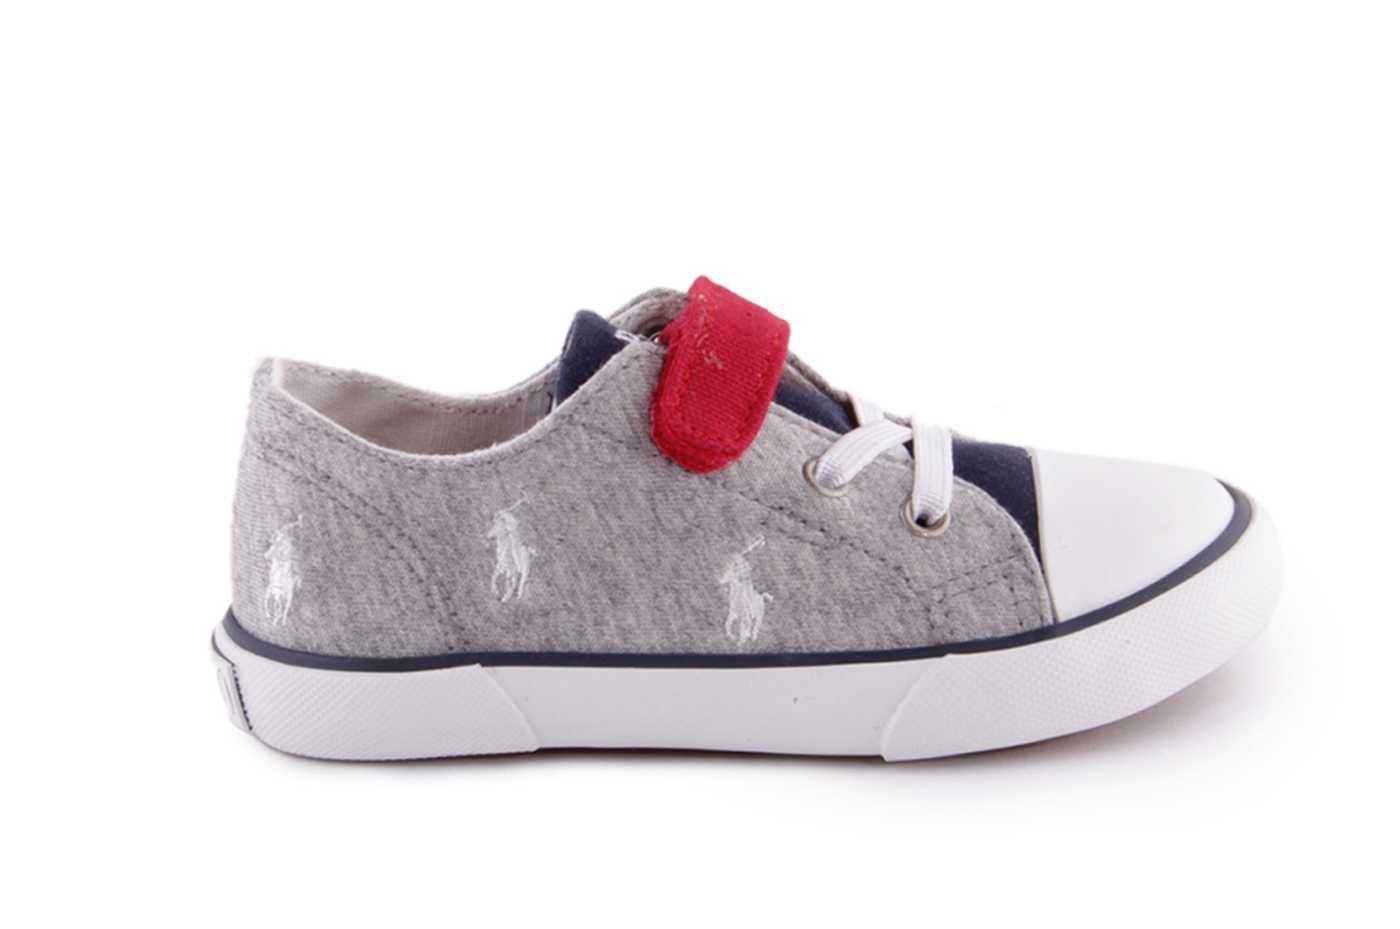 08aed344872e3 Comprar zapato tipo JOVEN NIÑO estilo LONA COLOR AZUL TEXTIL